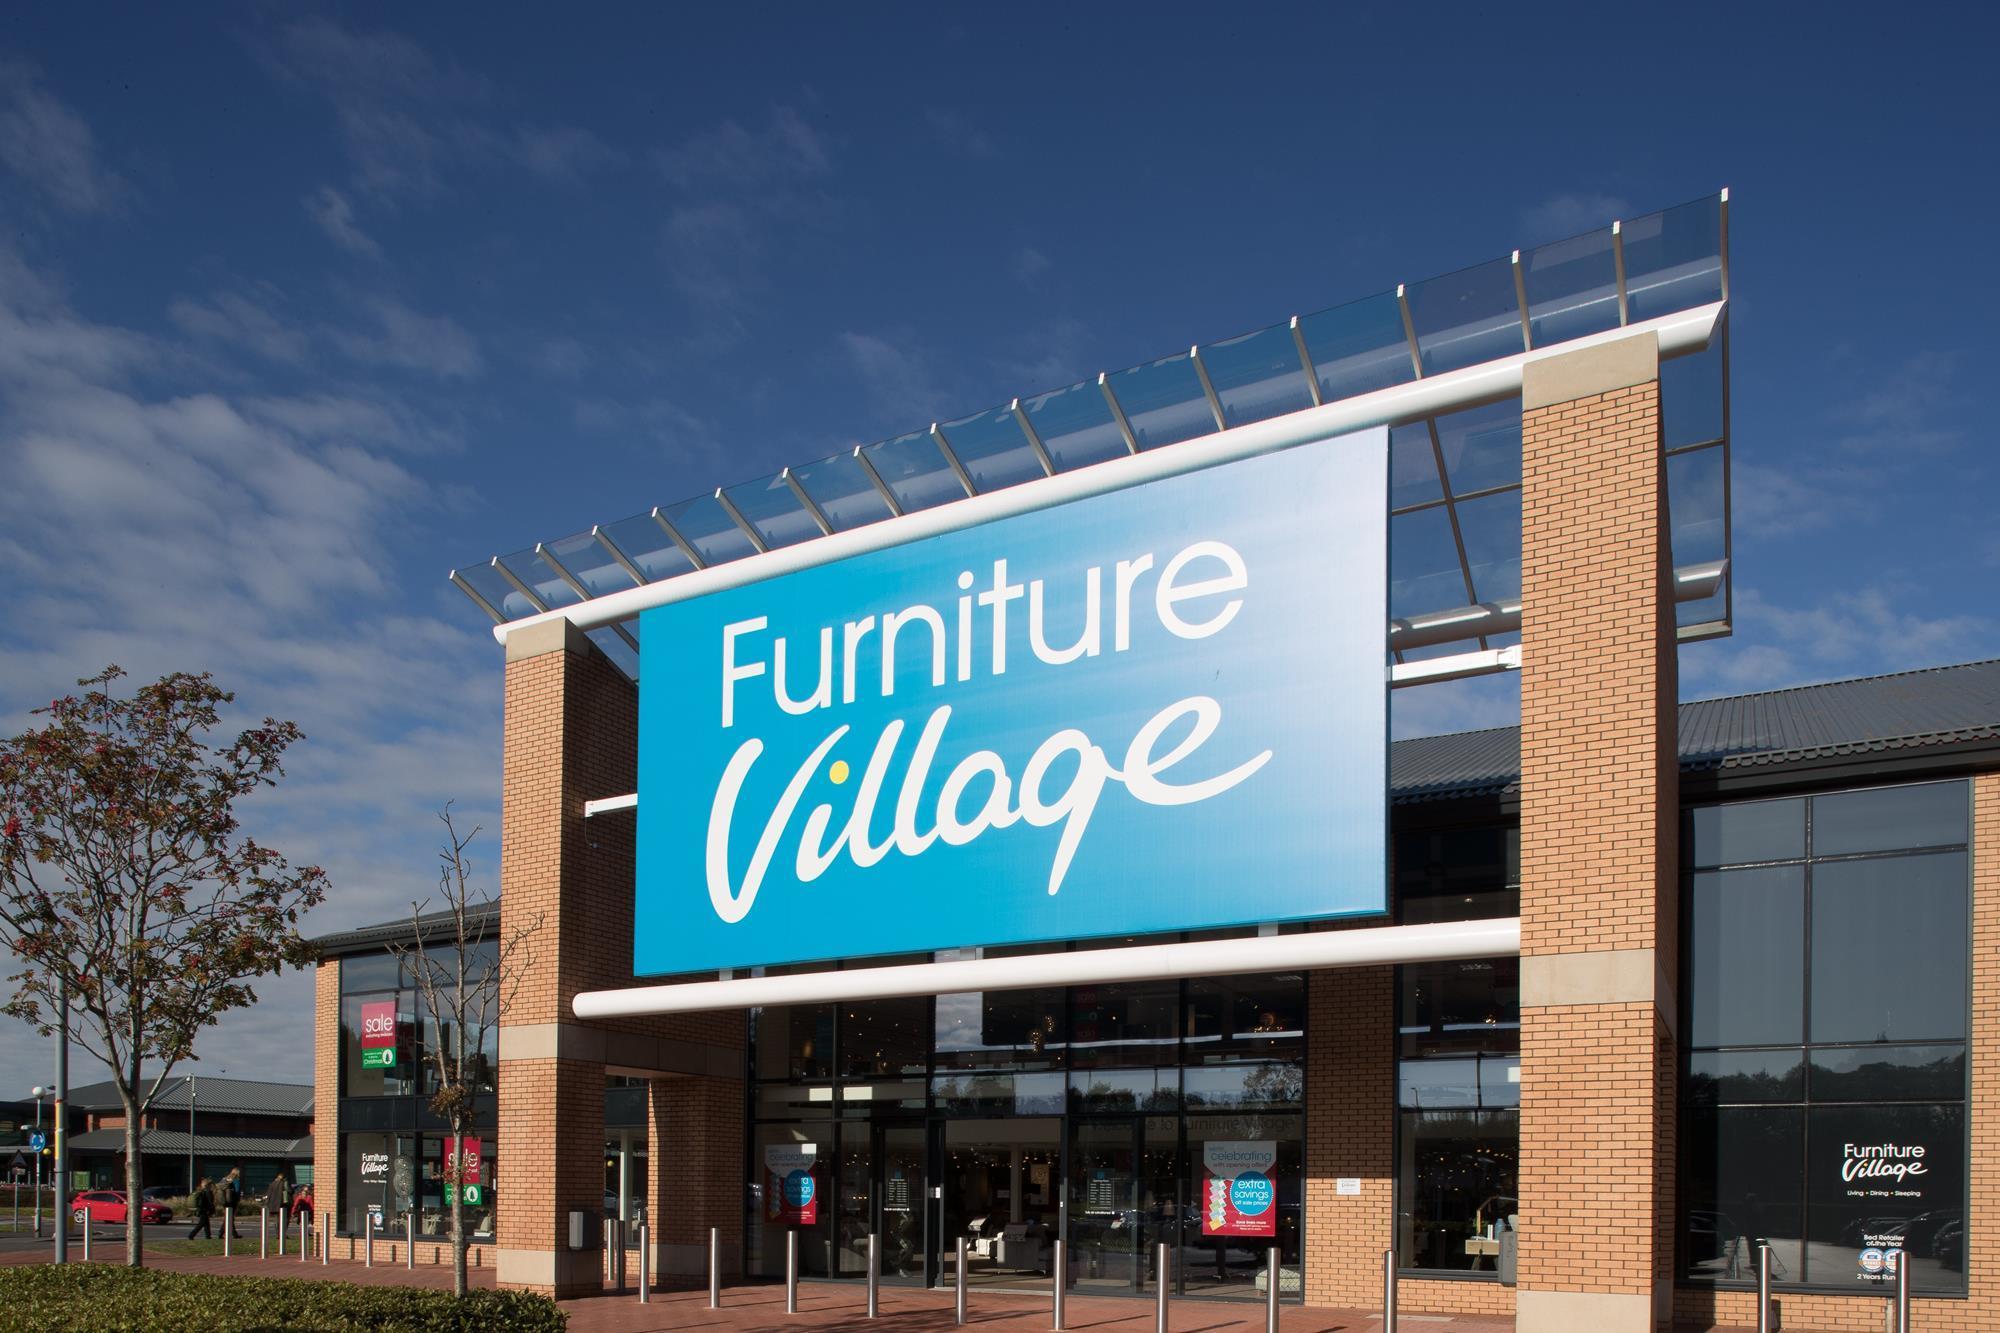 Furniture Village Plots Expansion After Securing Investment